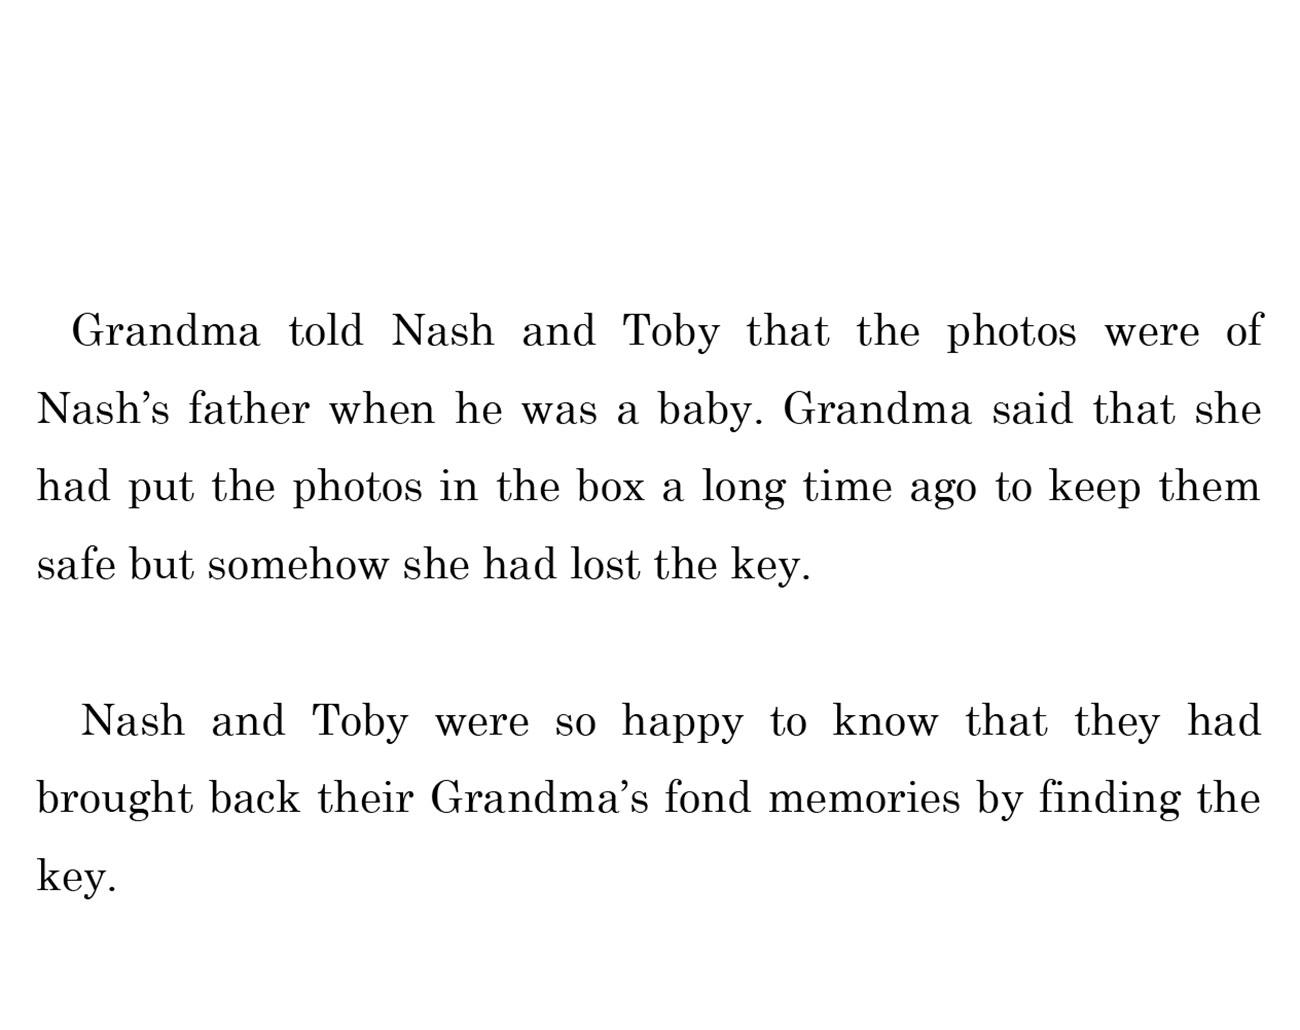 kids short story 'Down the memory lane with nash' by uma bala devarakonda - page 16